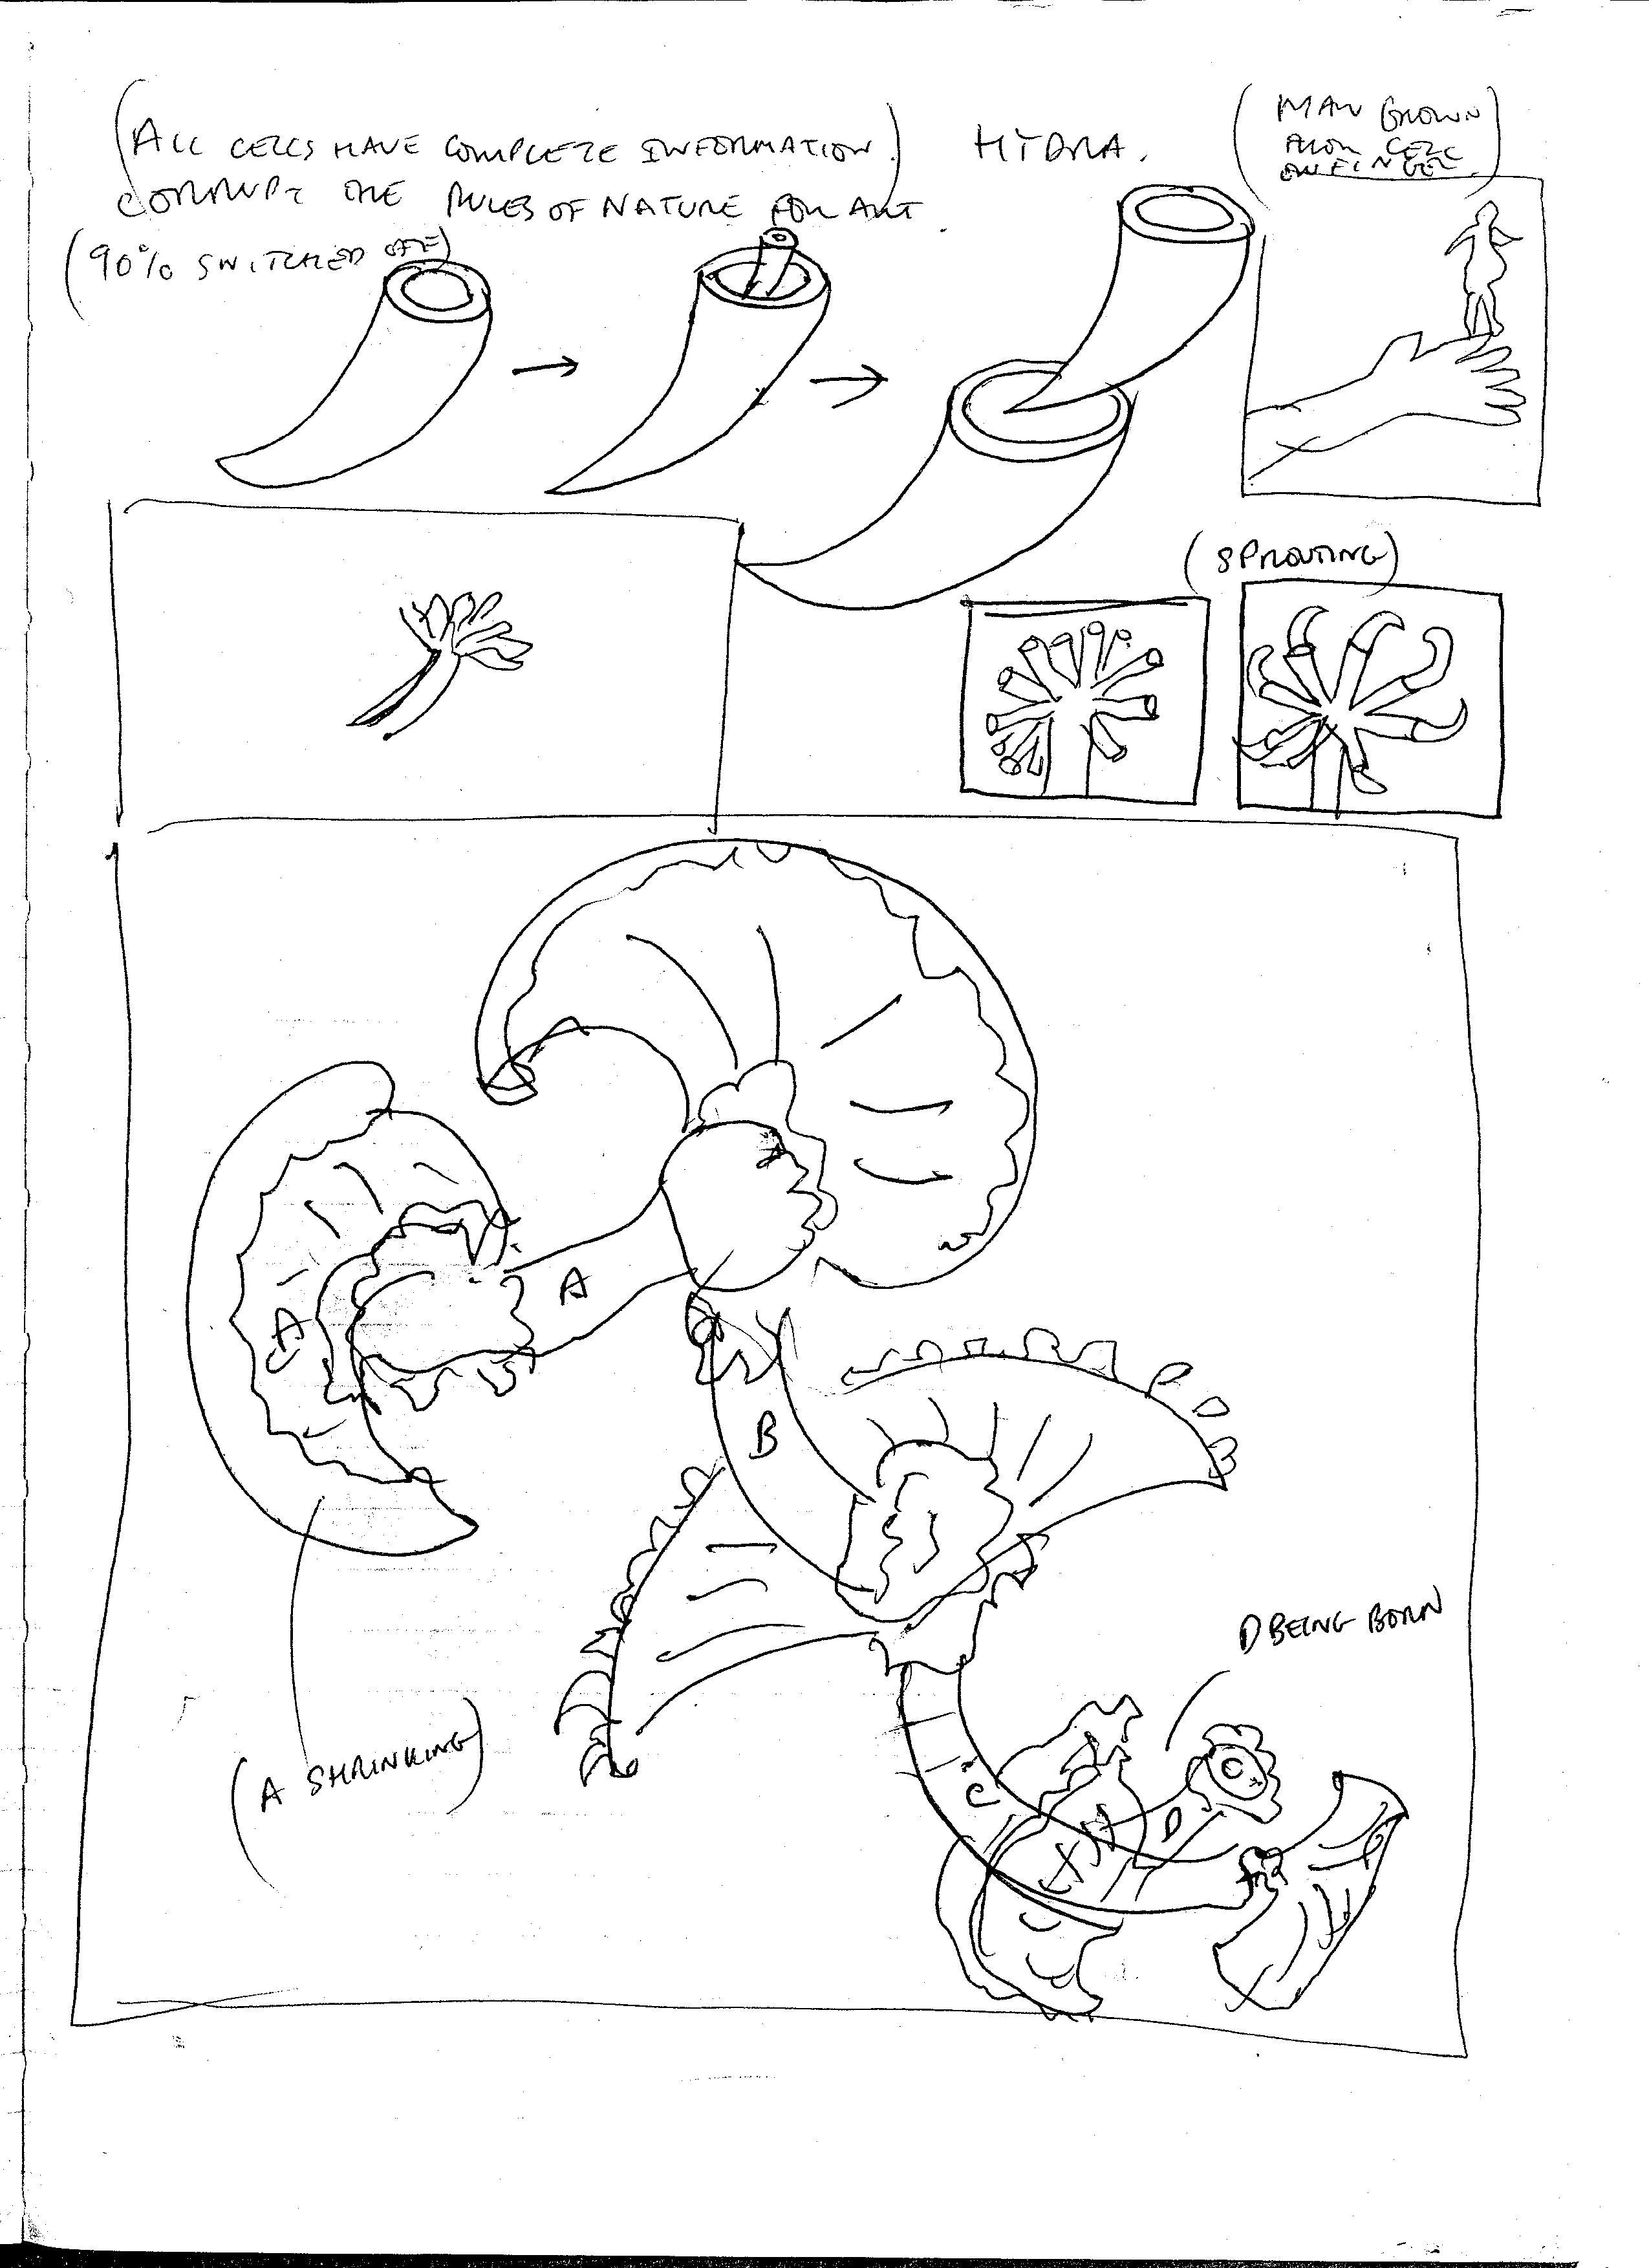 HandDrawIBMArt1992Q1No1